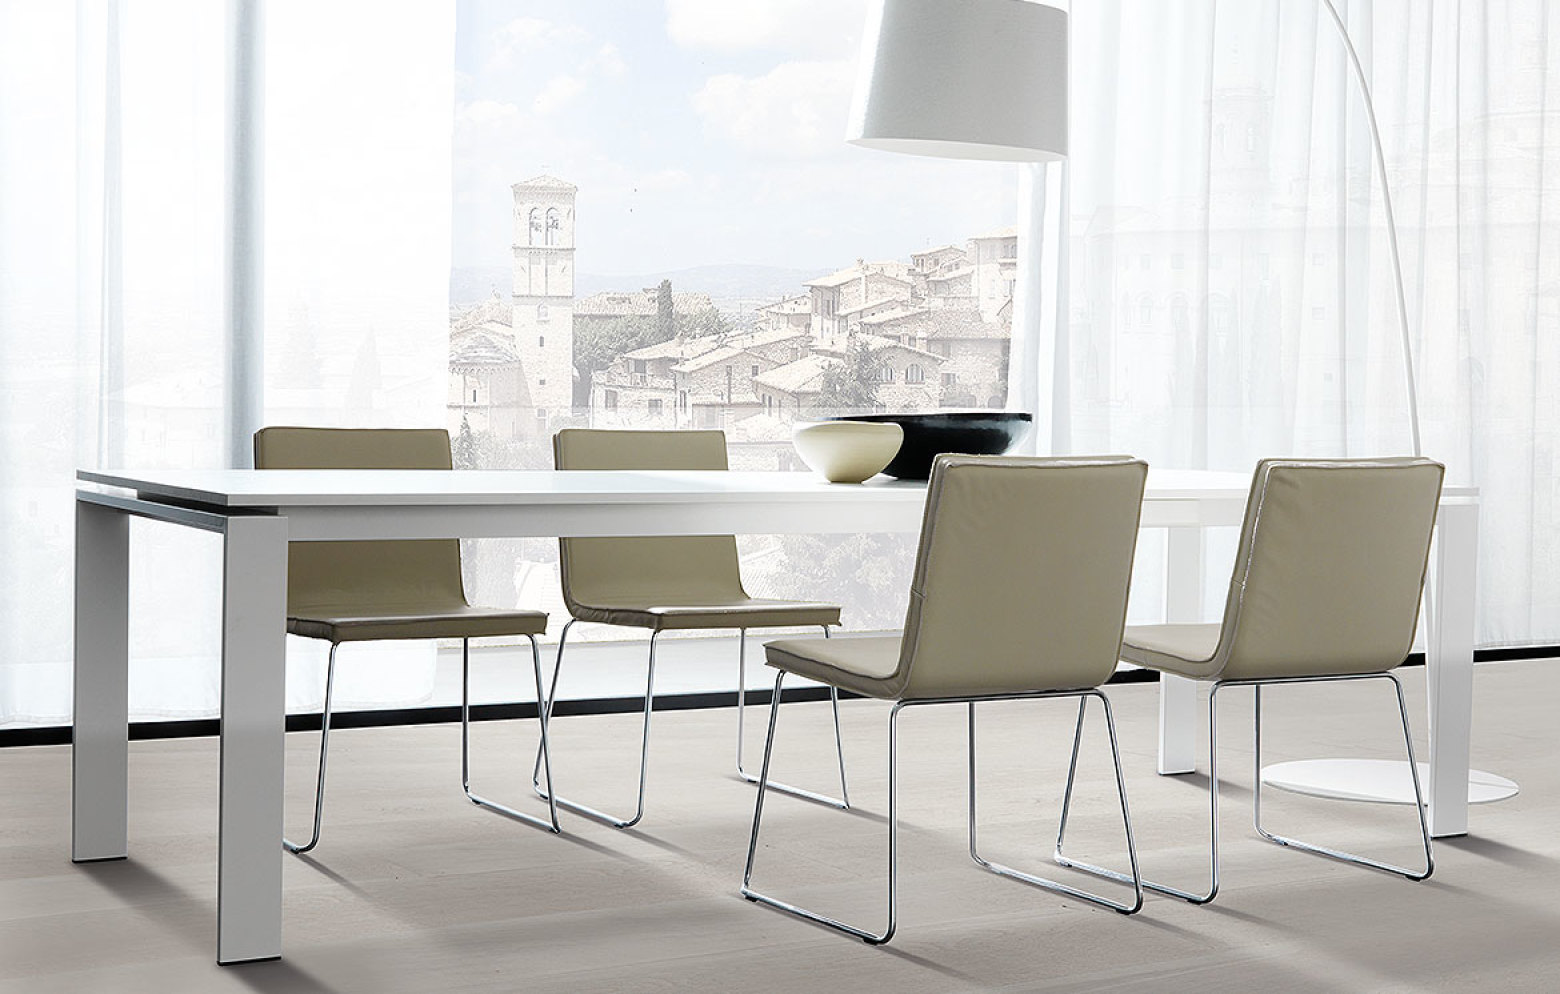 ANGOLO ALL | Esstische | Tische & Stühle | Who\'s perfect.